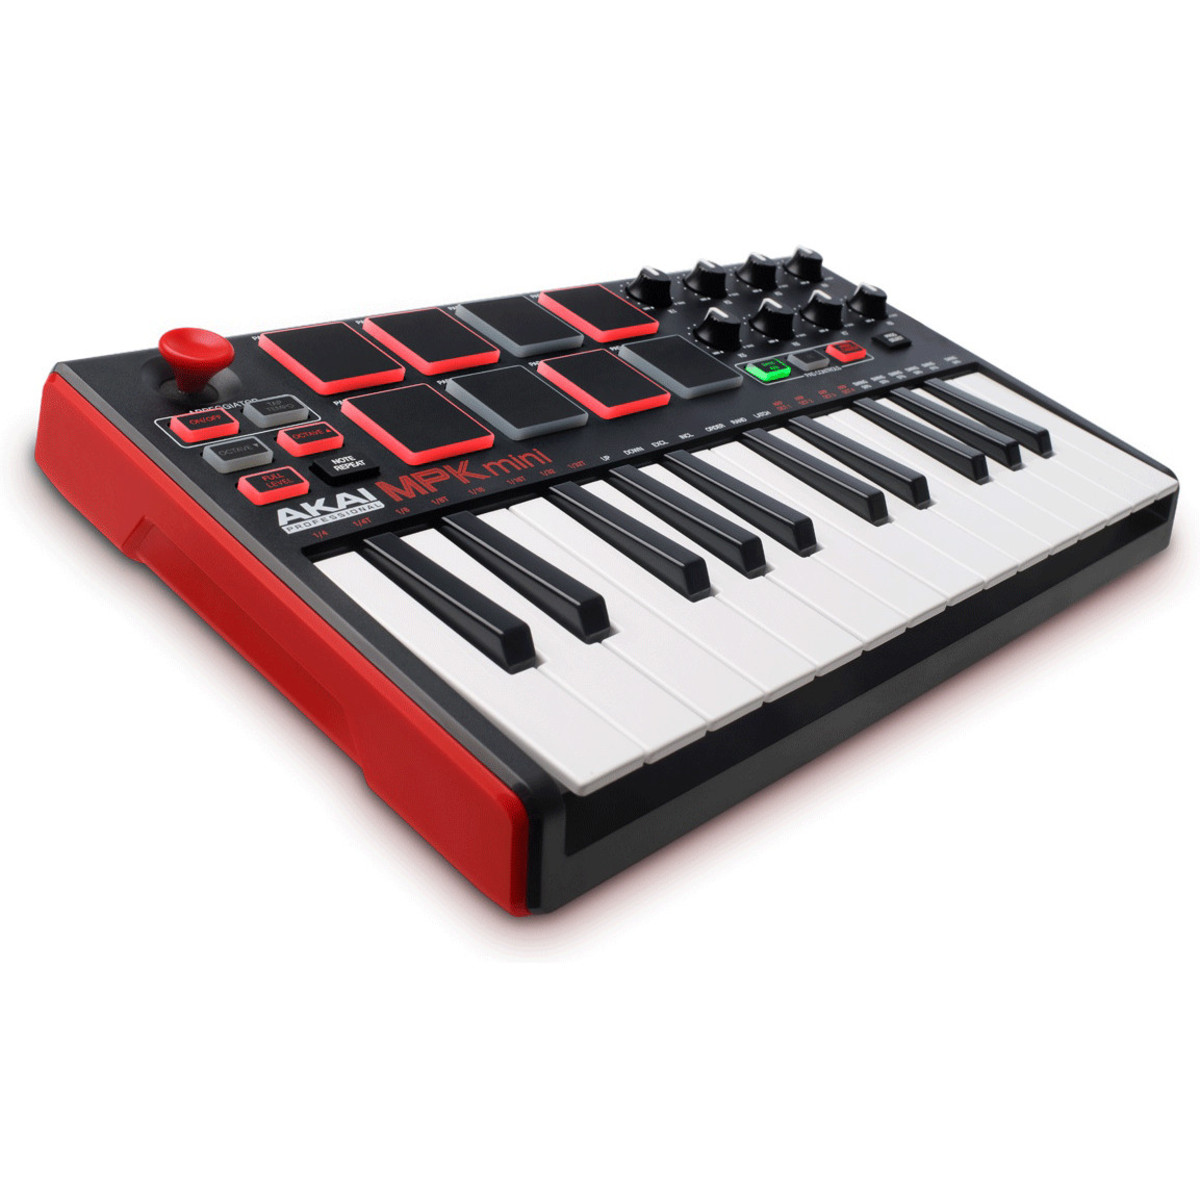 Image of Akai MPK Mini MK 2 Laptop Production Keyboard